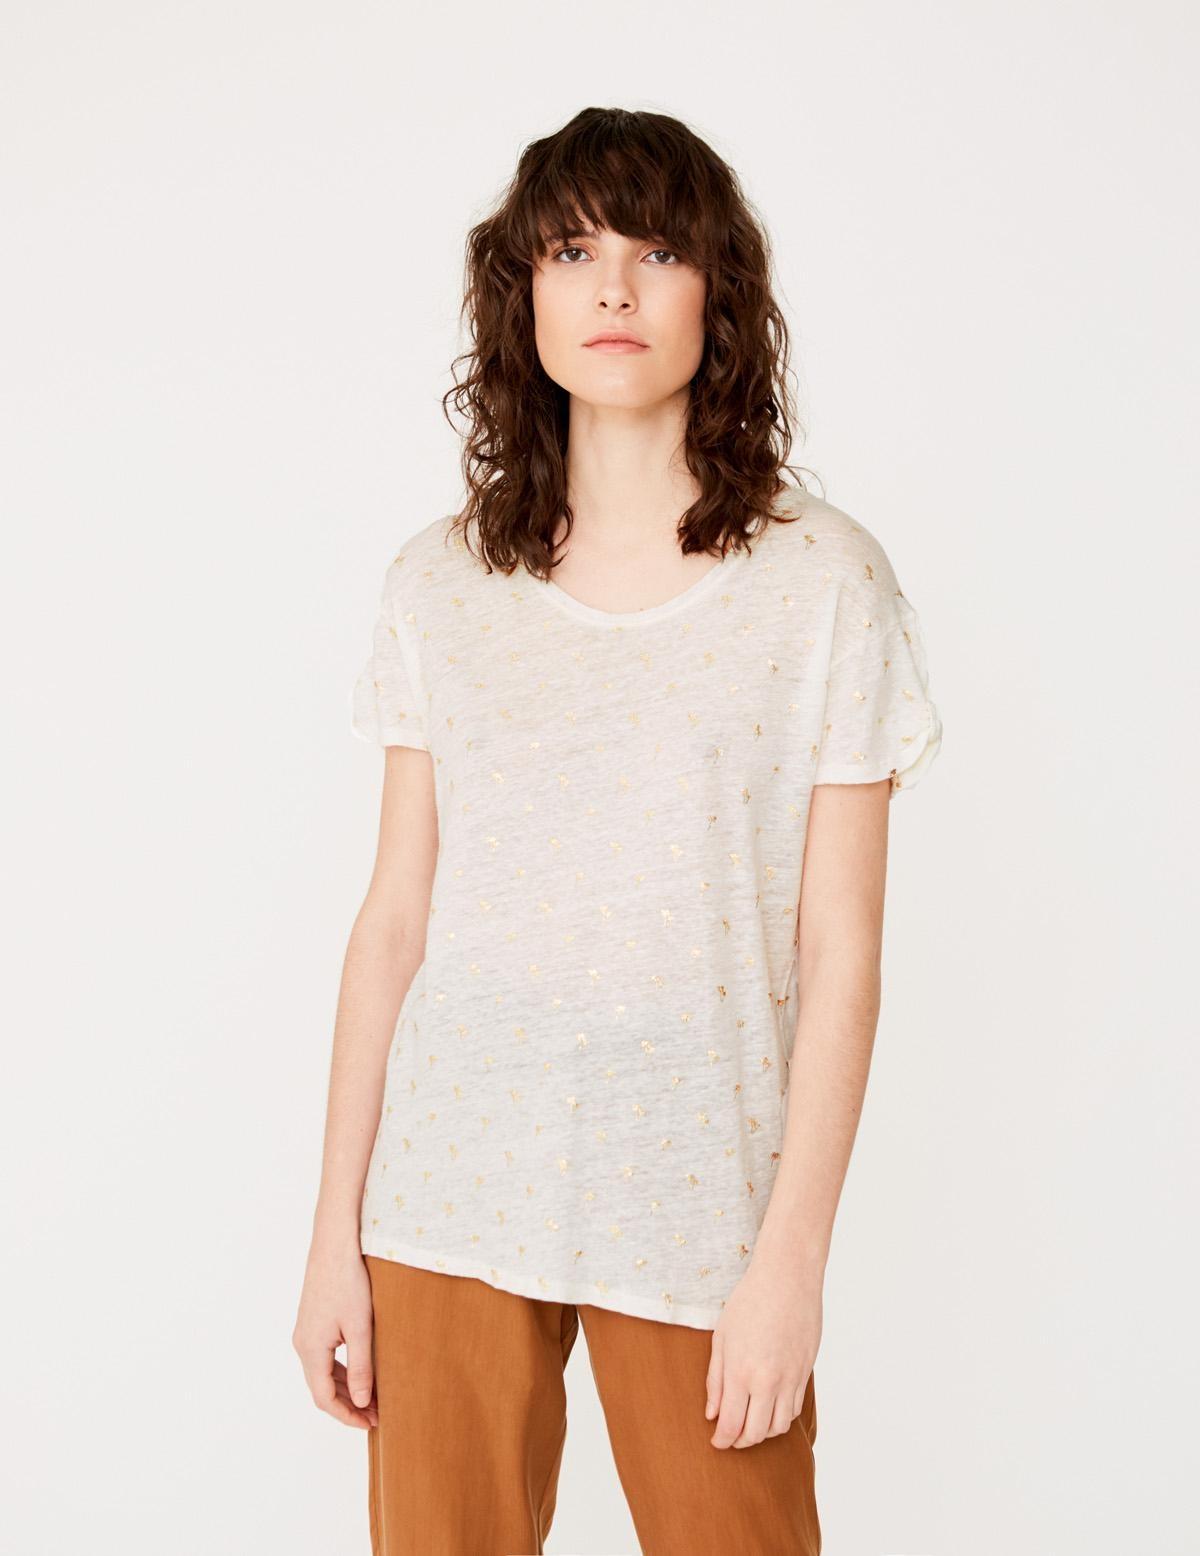 Camiseta manga corta estampado palmeras - Ítem1